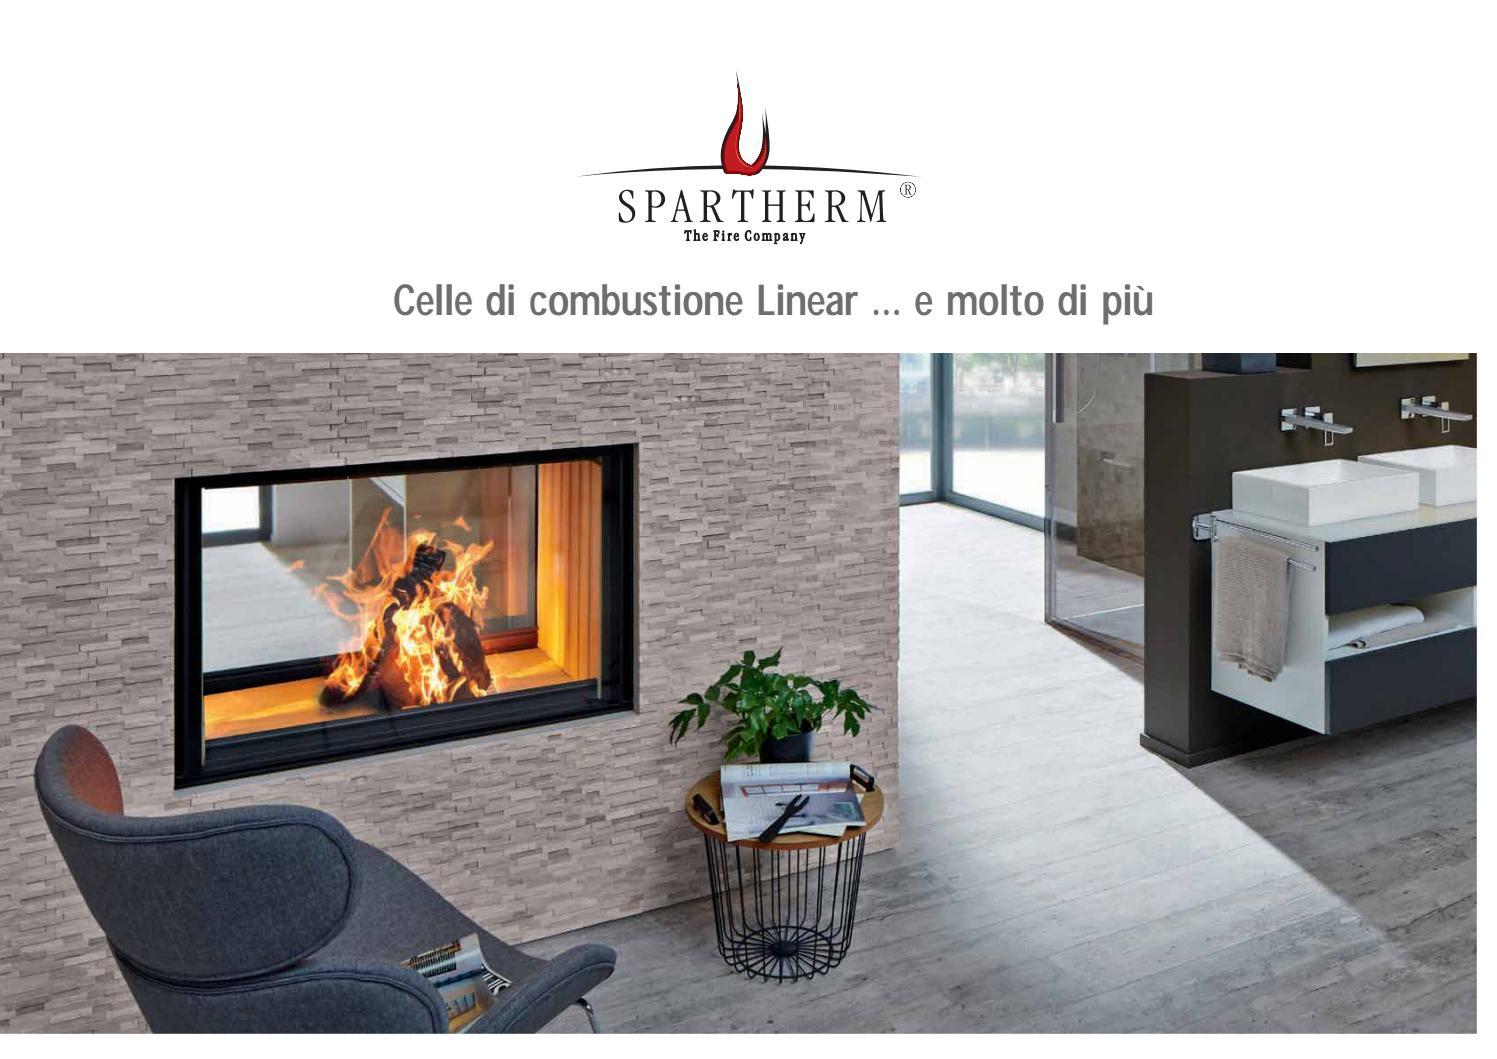 spartherm - focolari 2018idea studio caminetti - issuu